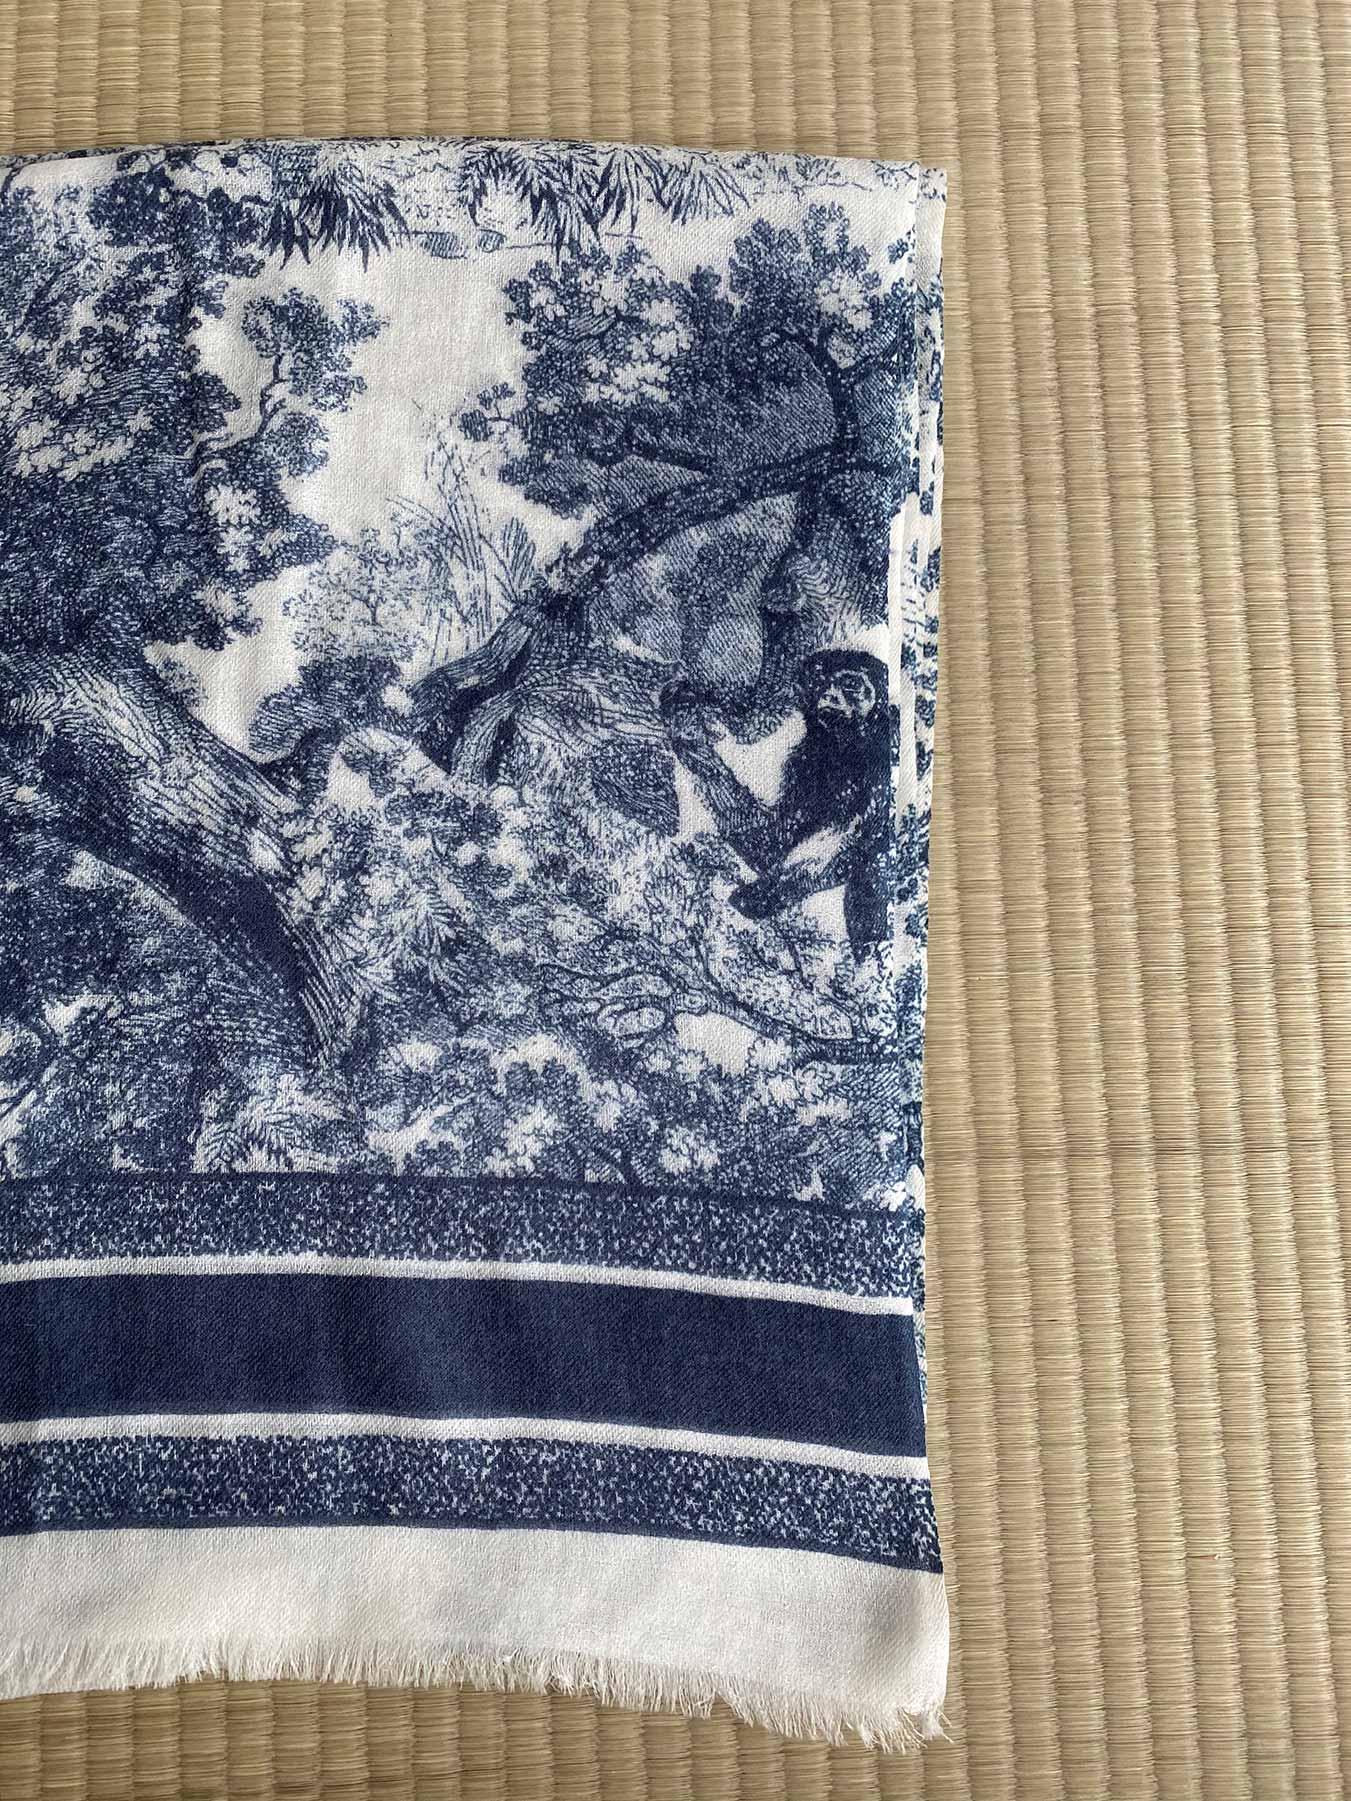 Savanna Prints Cashmere Scarf Blue 2